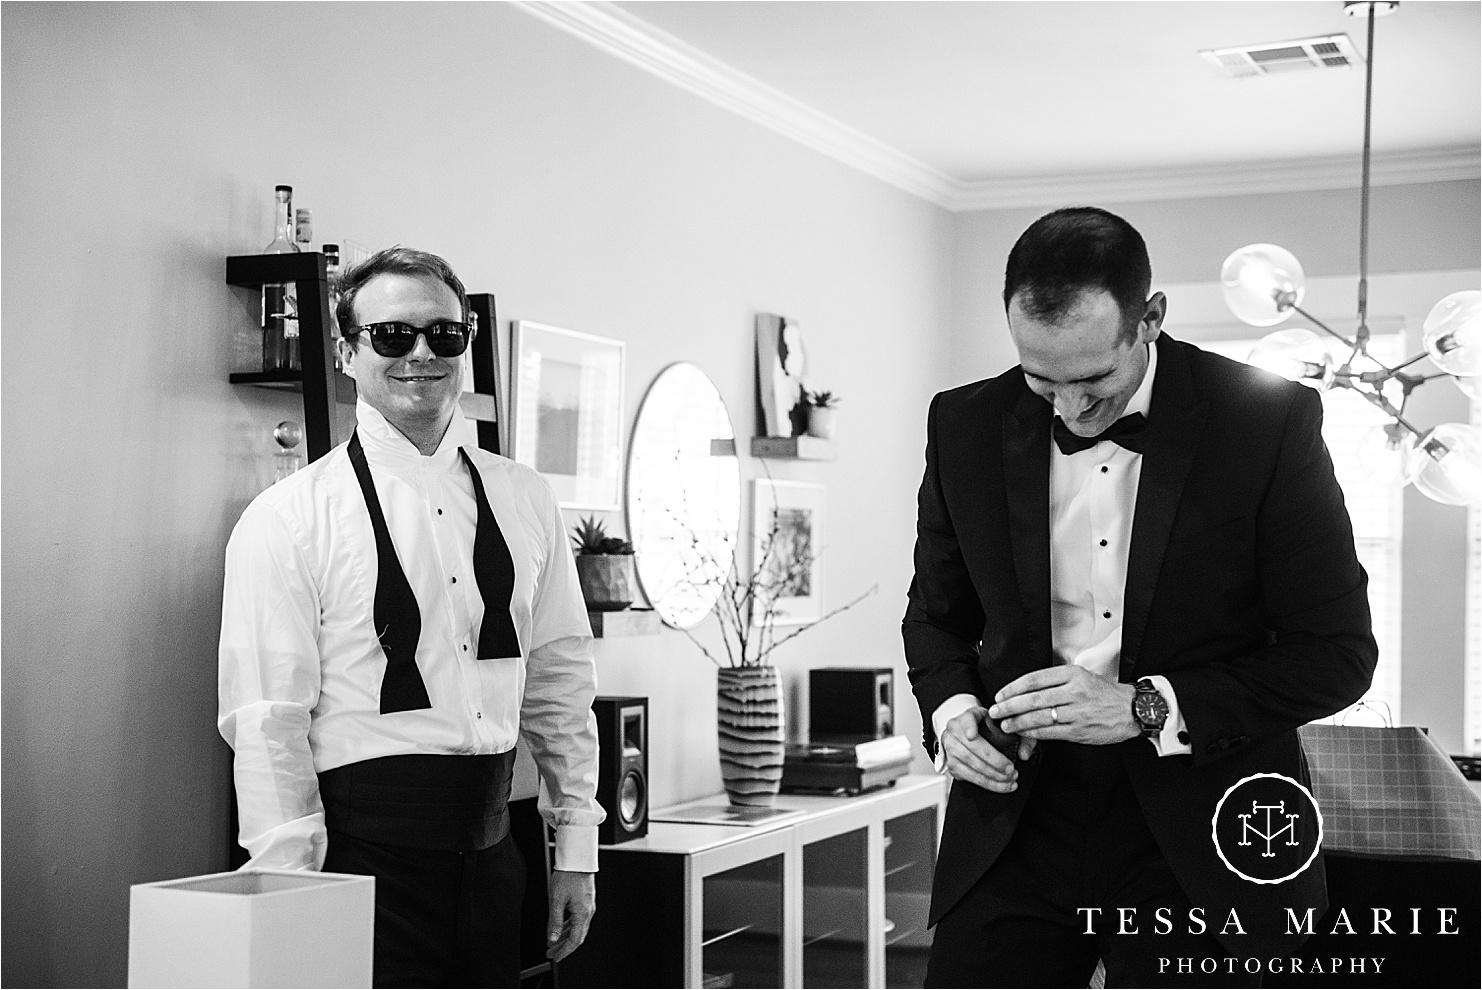 Tessa_marie_weddings_houston_wedding_photographer_The_astorian_0033.jpg